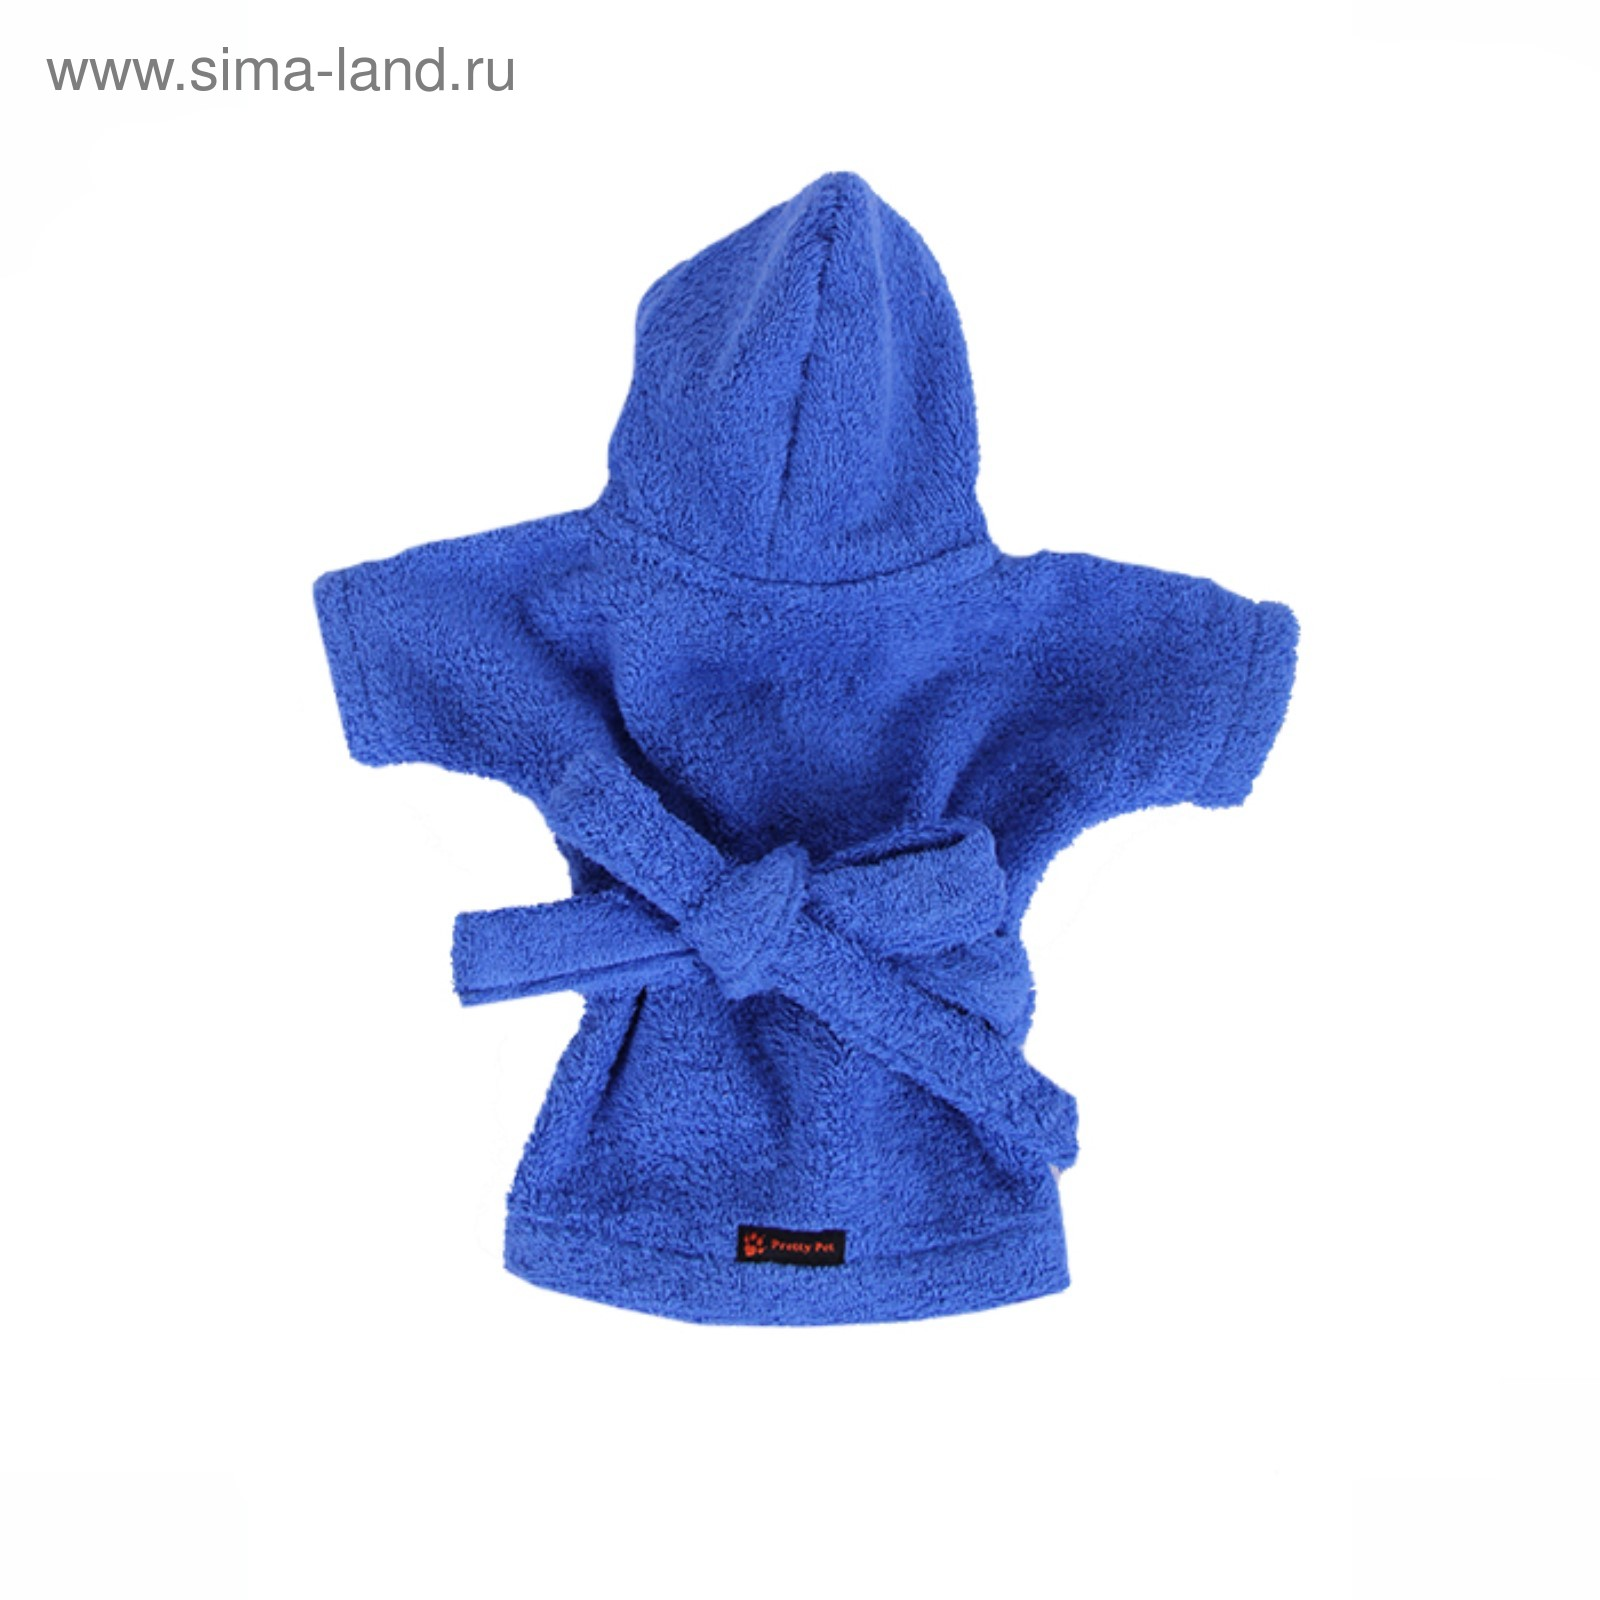 bb708cde87e7c Халат Pretty Pet, размер М (ДС 28-30 см, ОГ 41-43 см), синий ...